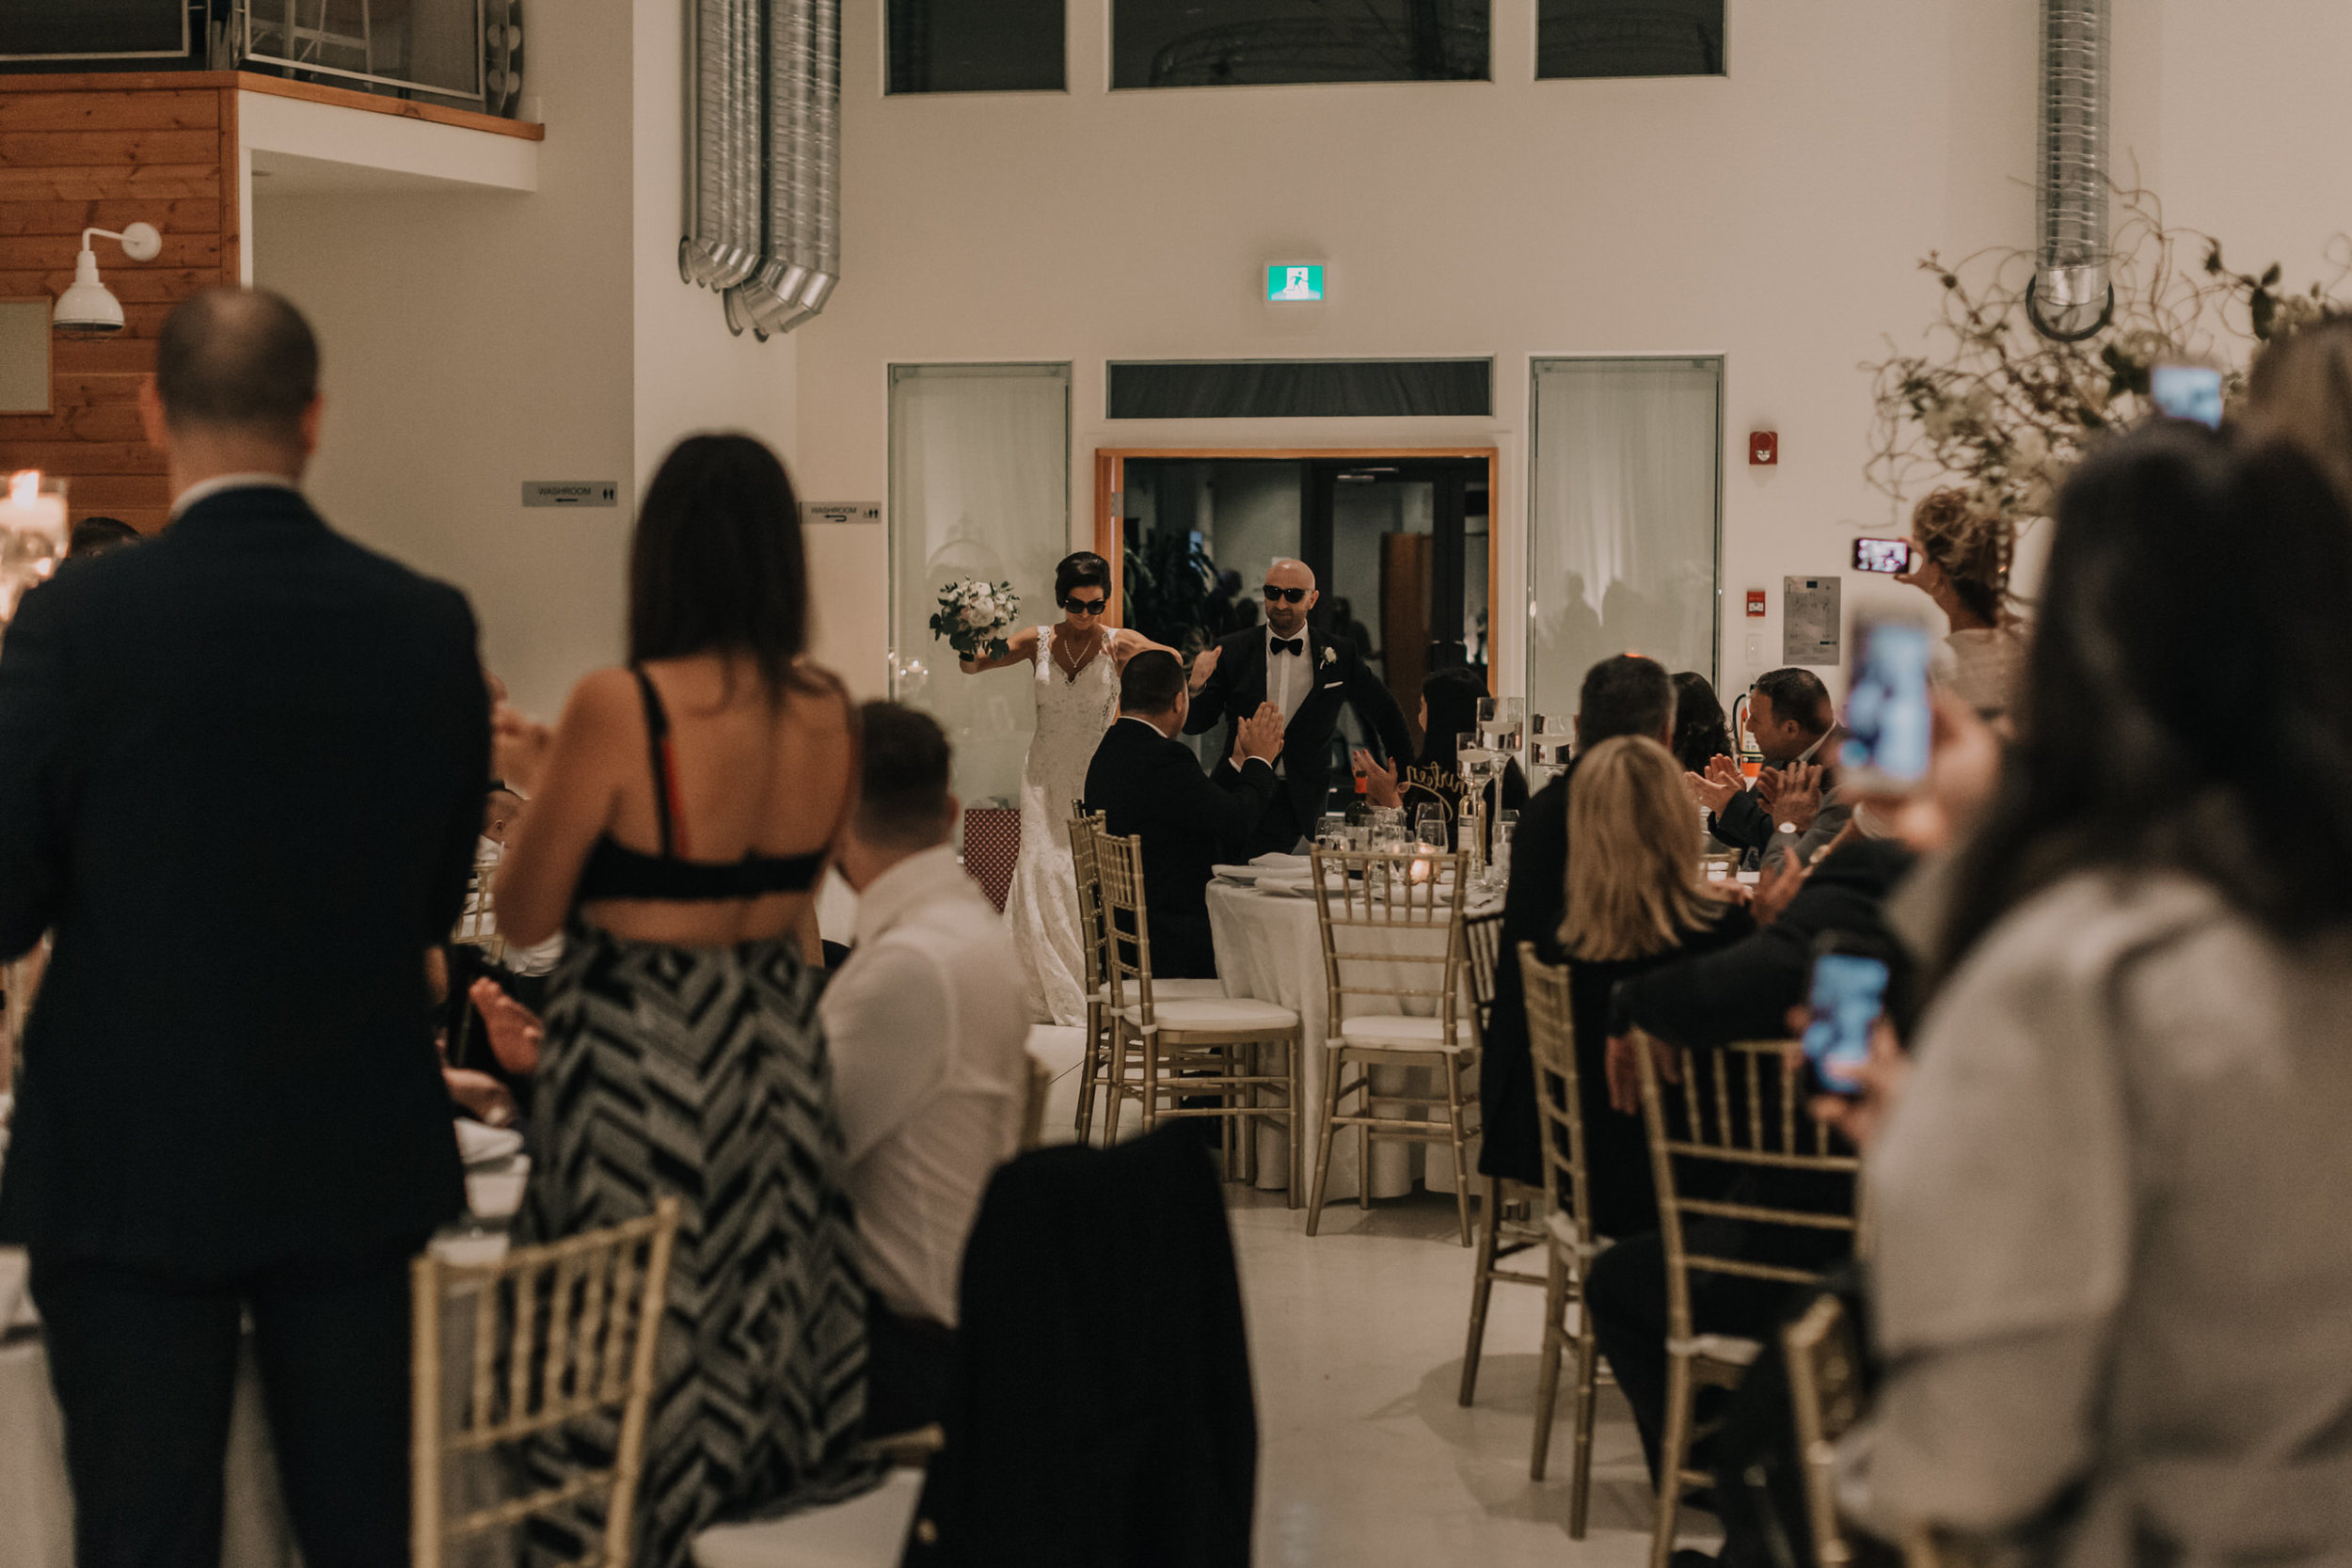 Pitt Meadows Wedding Photographer - Sky Hangar Wedding Photos - Vancouver Wedding Photographer & Videographer - Sunshine Coast Wedding Photos - Sunshine Coast Wedding Photographer - Jennifer Picard Photography - IMG_6015.jpg